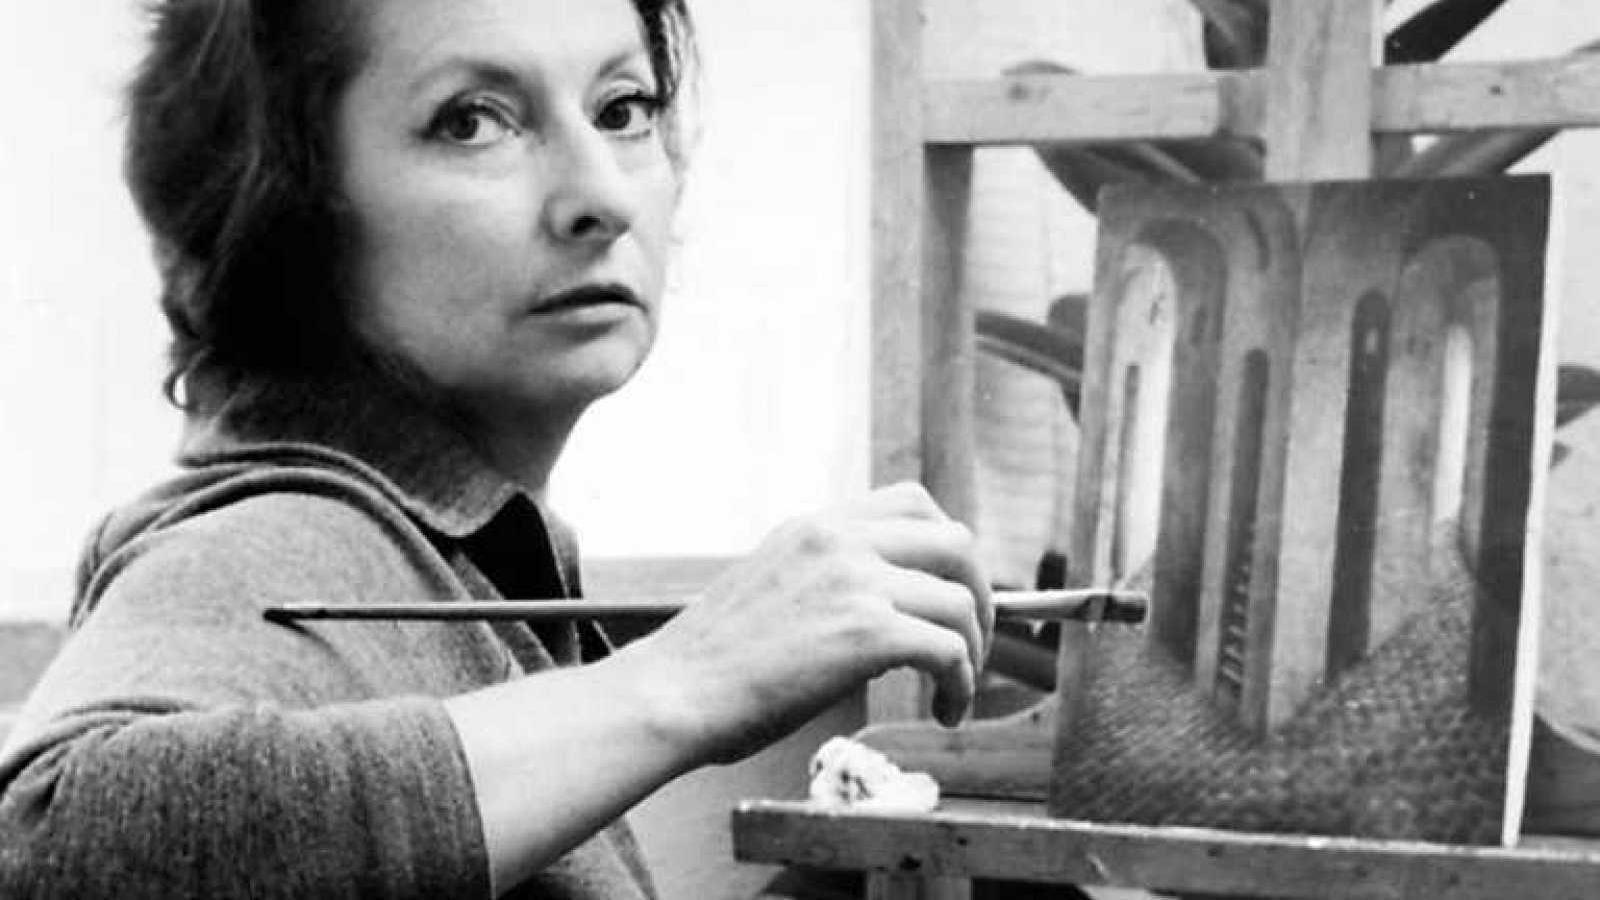 Documental de la sèrie de Rtve 'Imprescindibles' dedicat a la pintora Remedios Varo